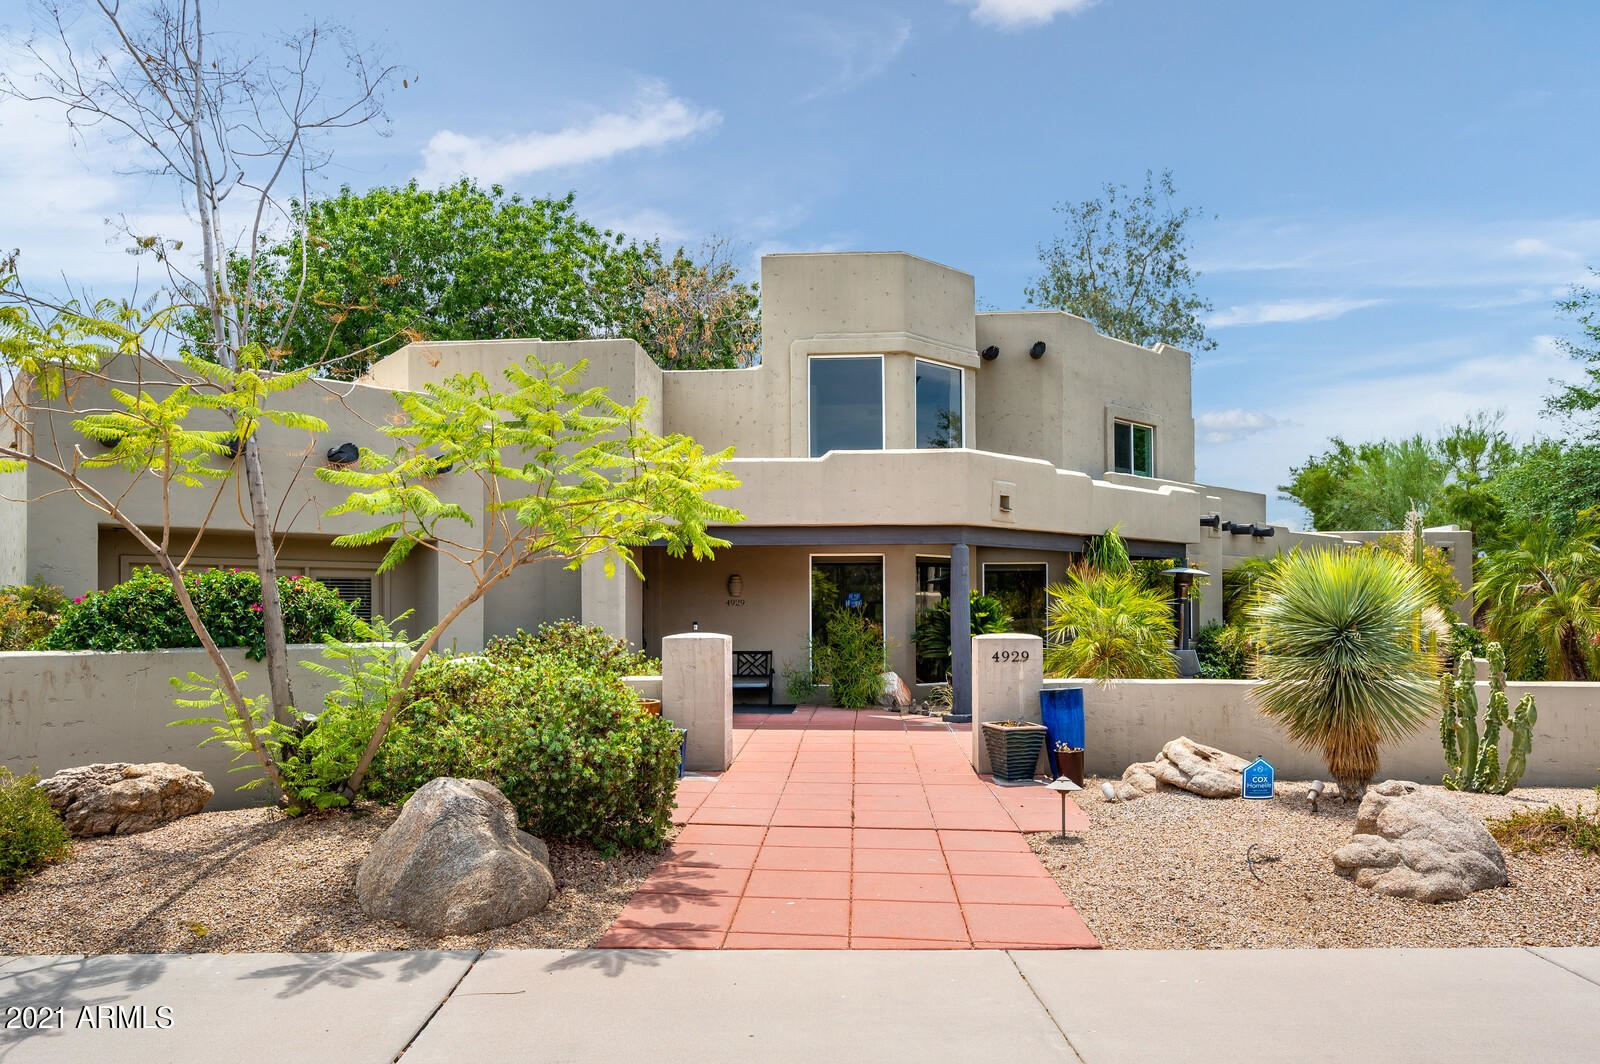 Photo of 4929 E COCHISE Road, Paradise Valley, AZ 85253 (MLS # 6262743)